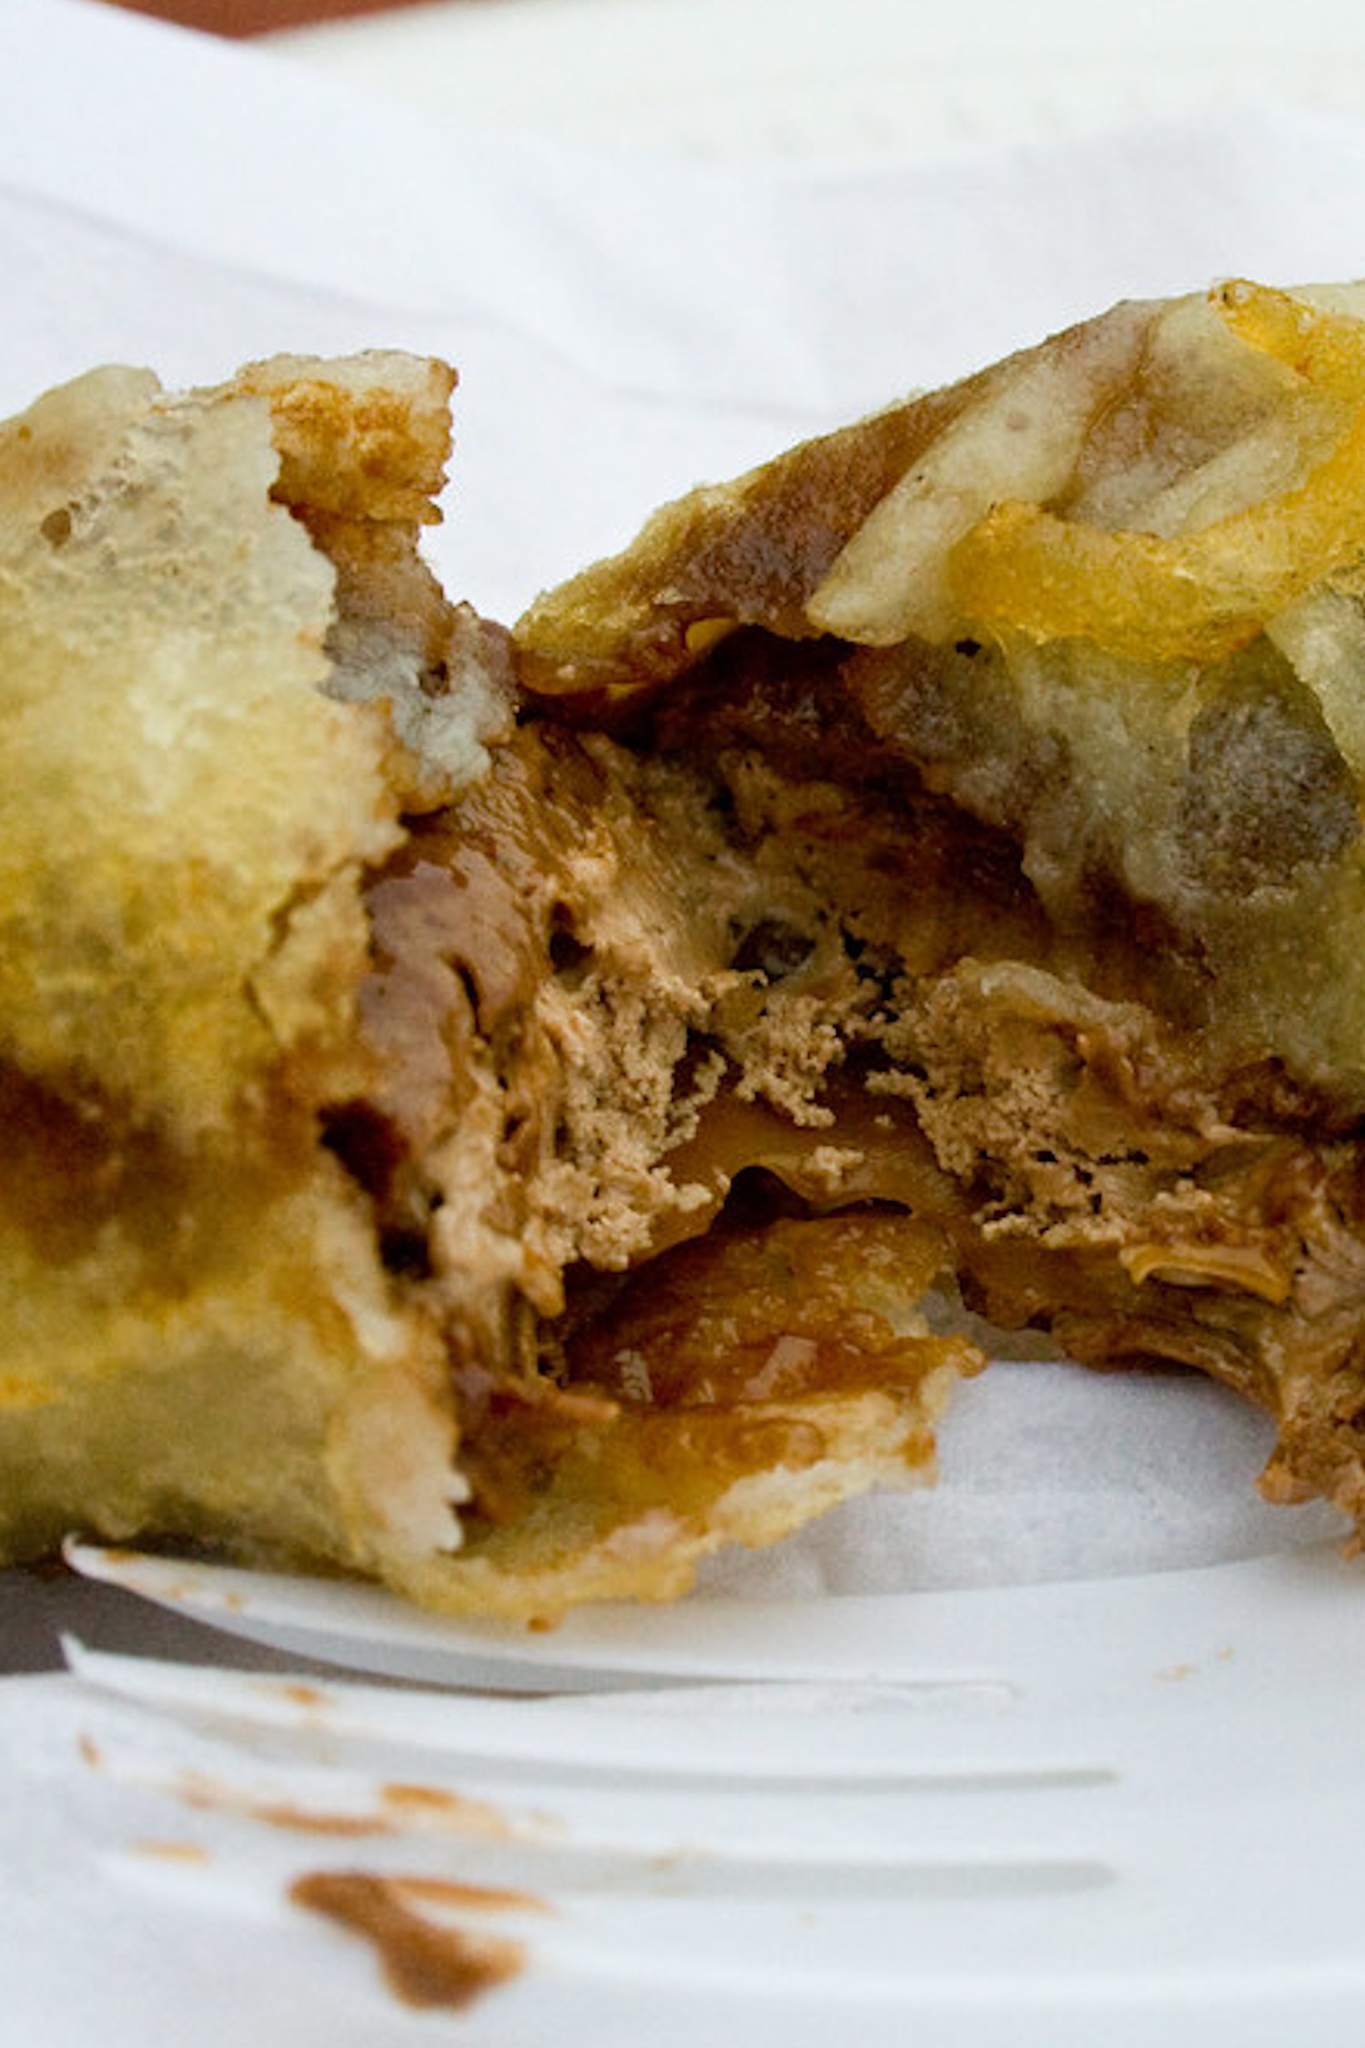 A common scottish food, deep fried mars bar.